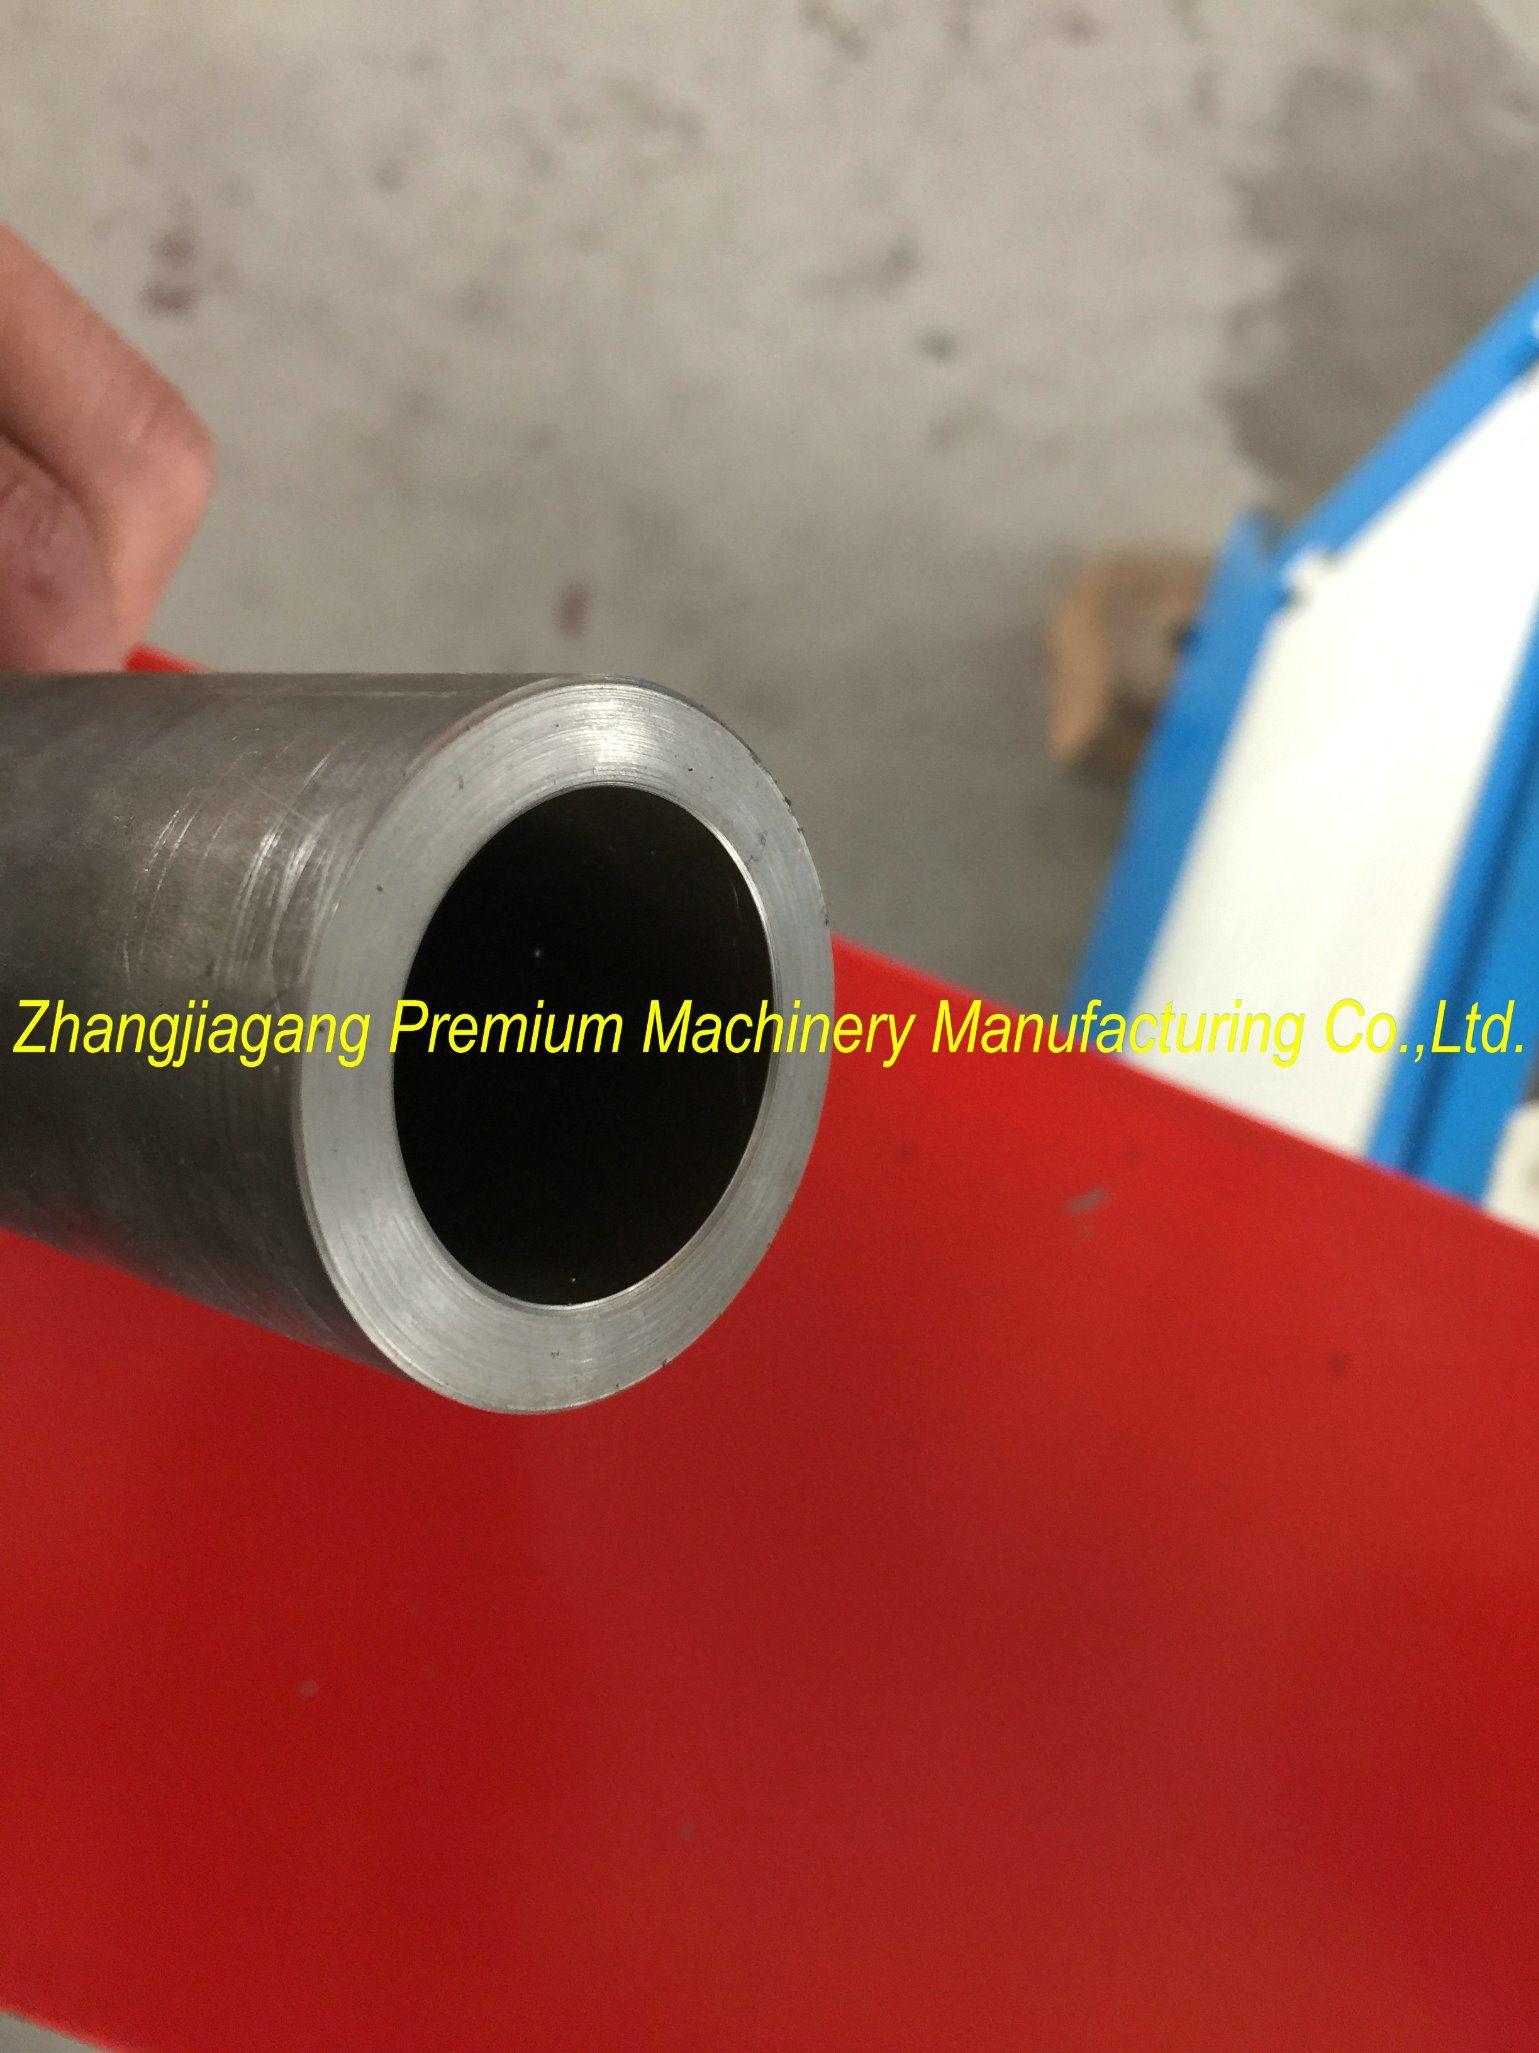 Plm-Fa80 Double Head Tube Chamfering Machine for Bar Chamfering